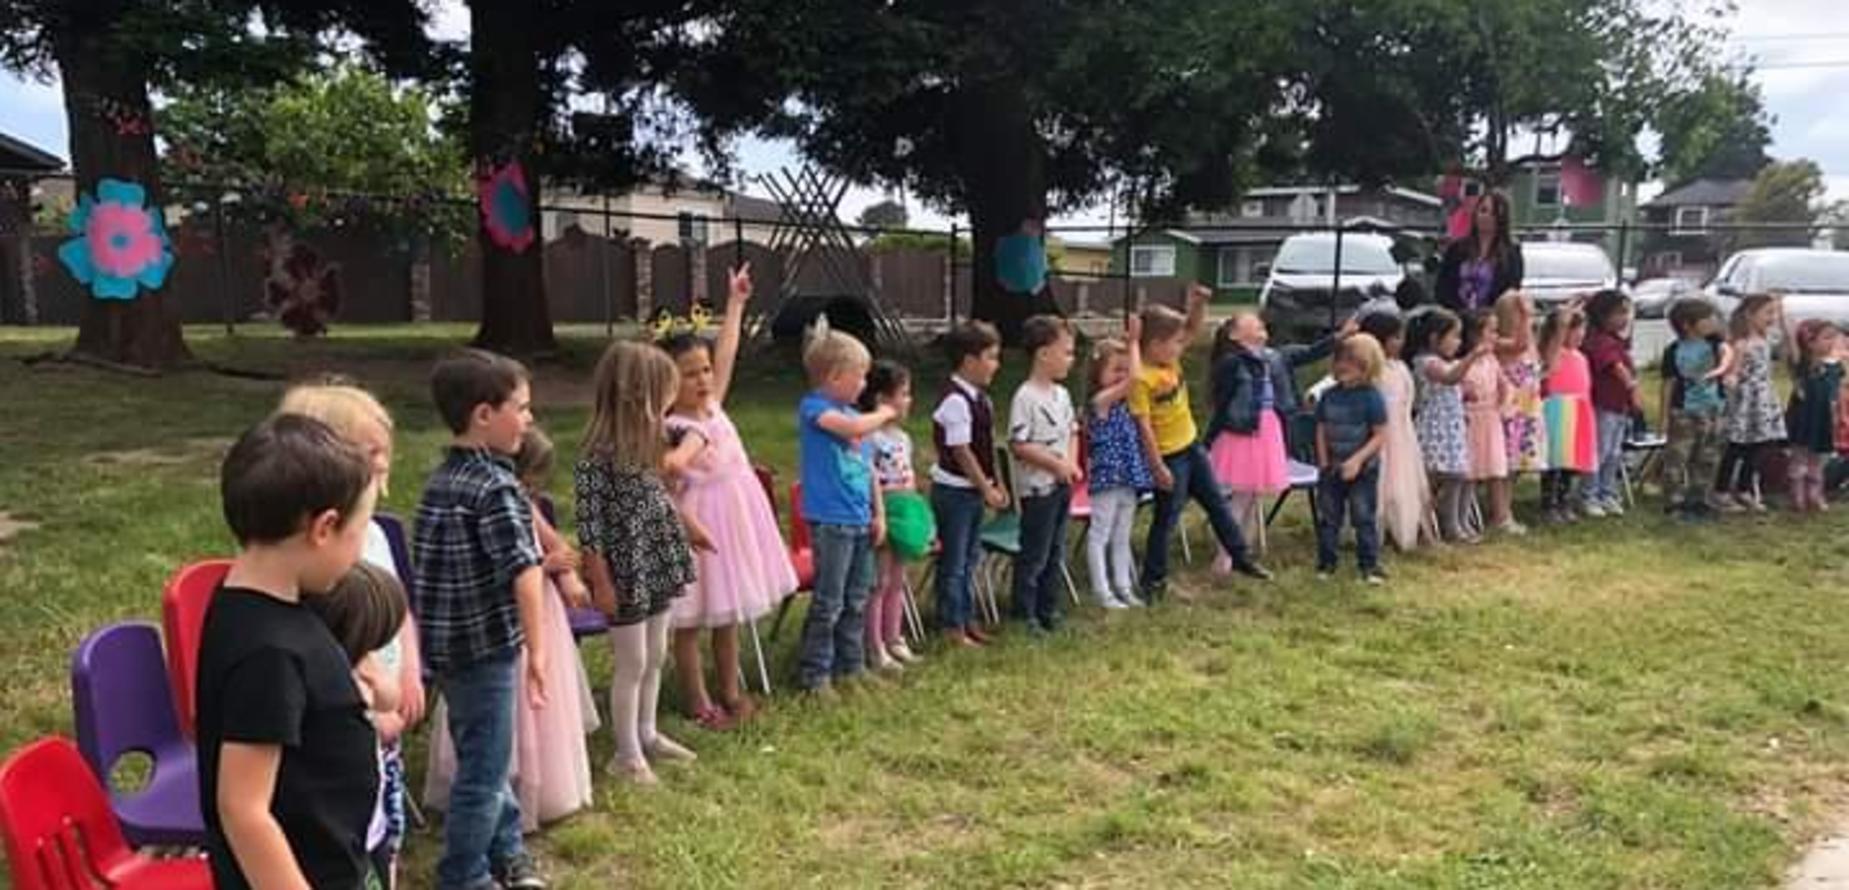 Children standing at Graduation time